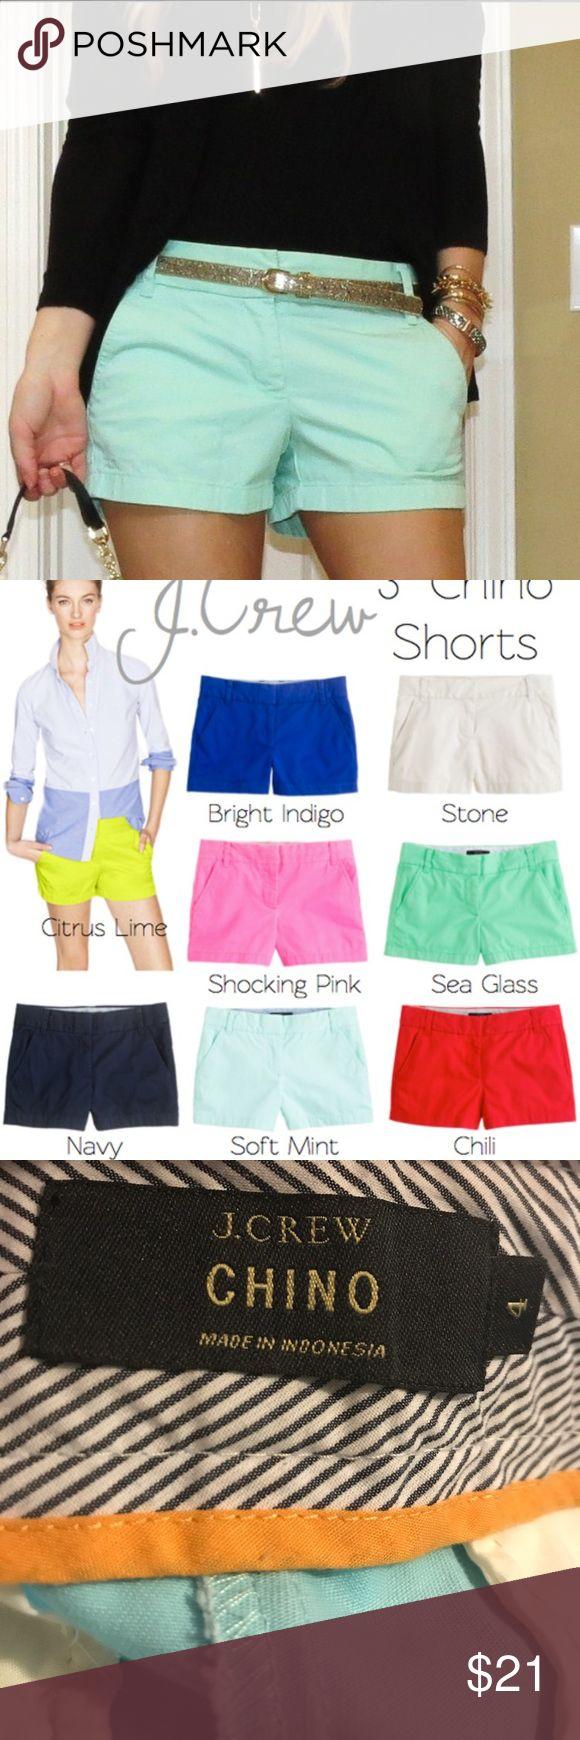 "J. crew Soft mint Chino Shorts 3"" inseam like New J. crew Soft mint 3"" chino shorts • like New Condition • no trades J. Crew Shorts"